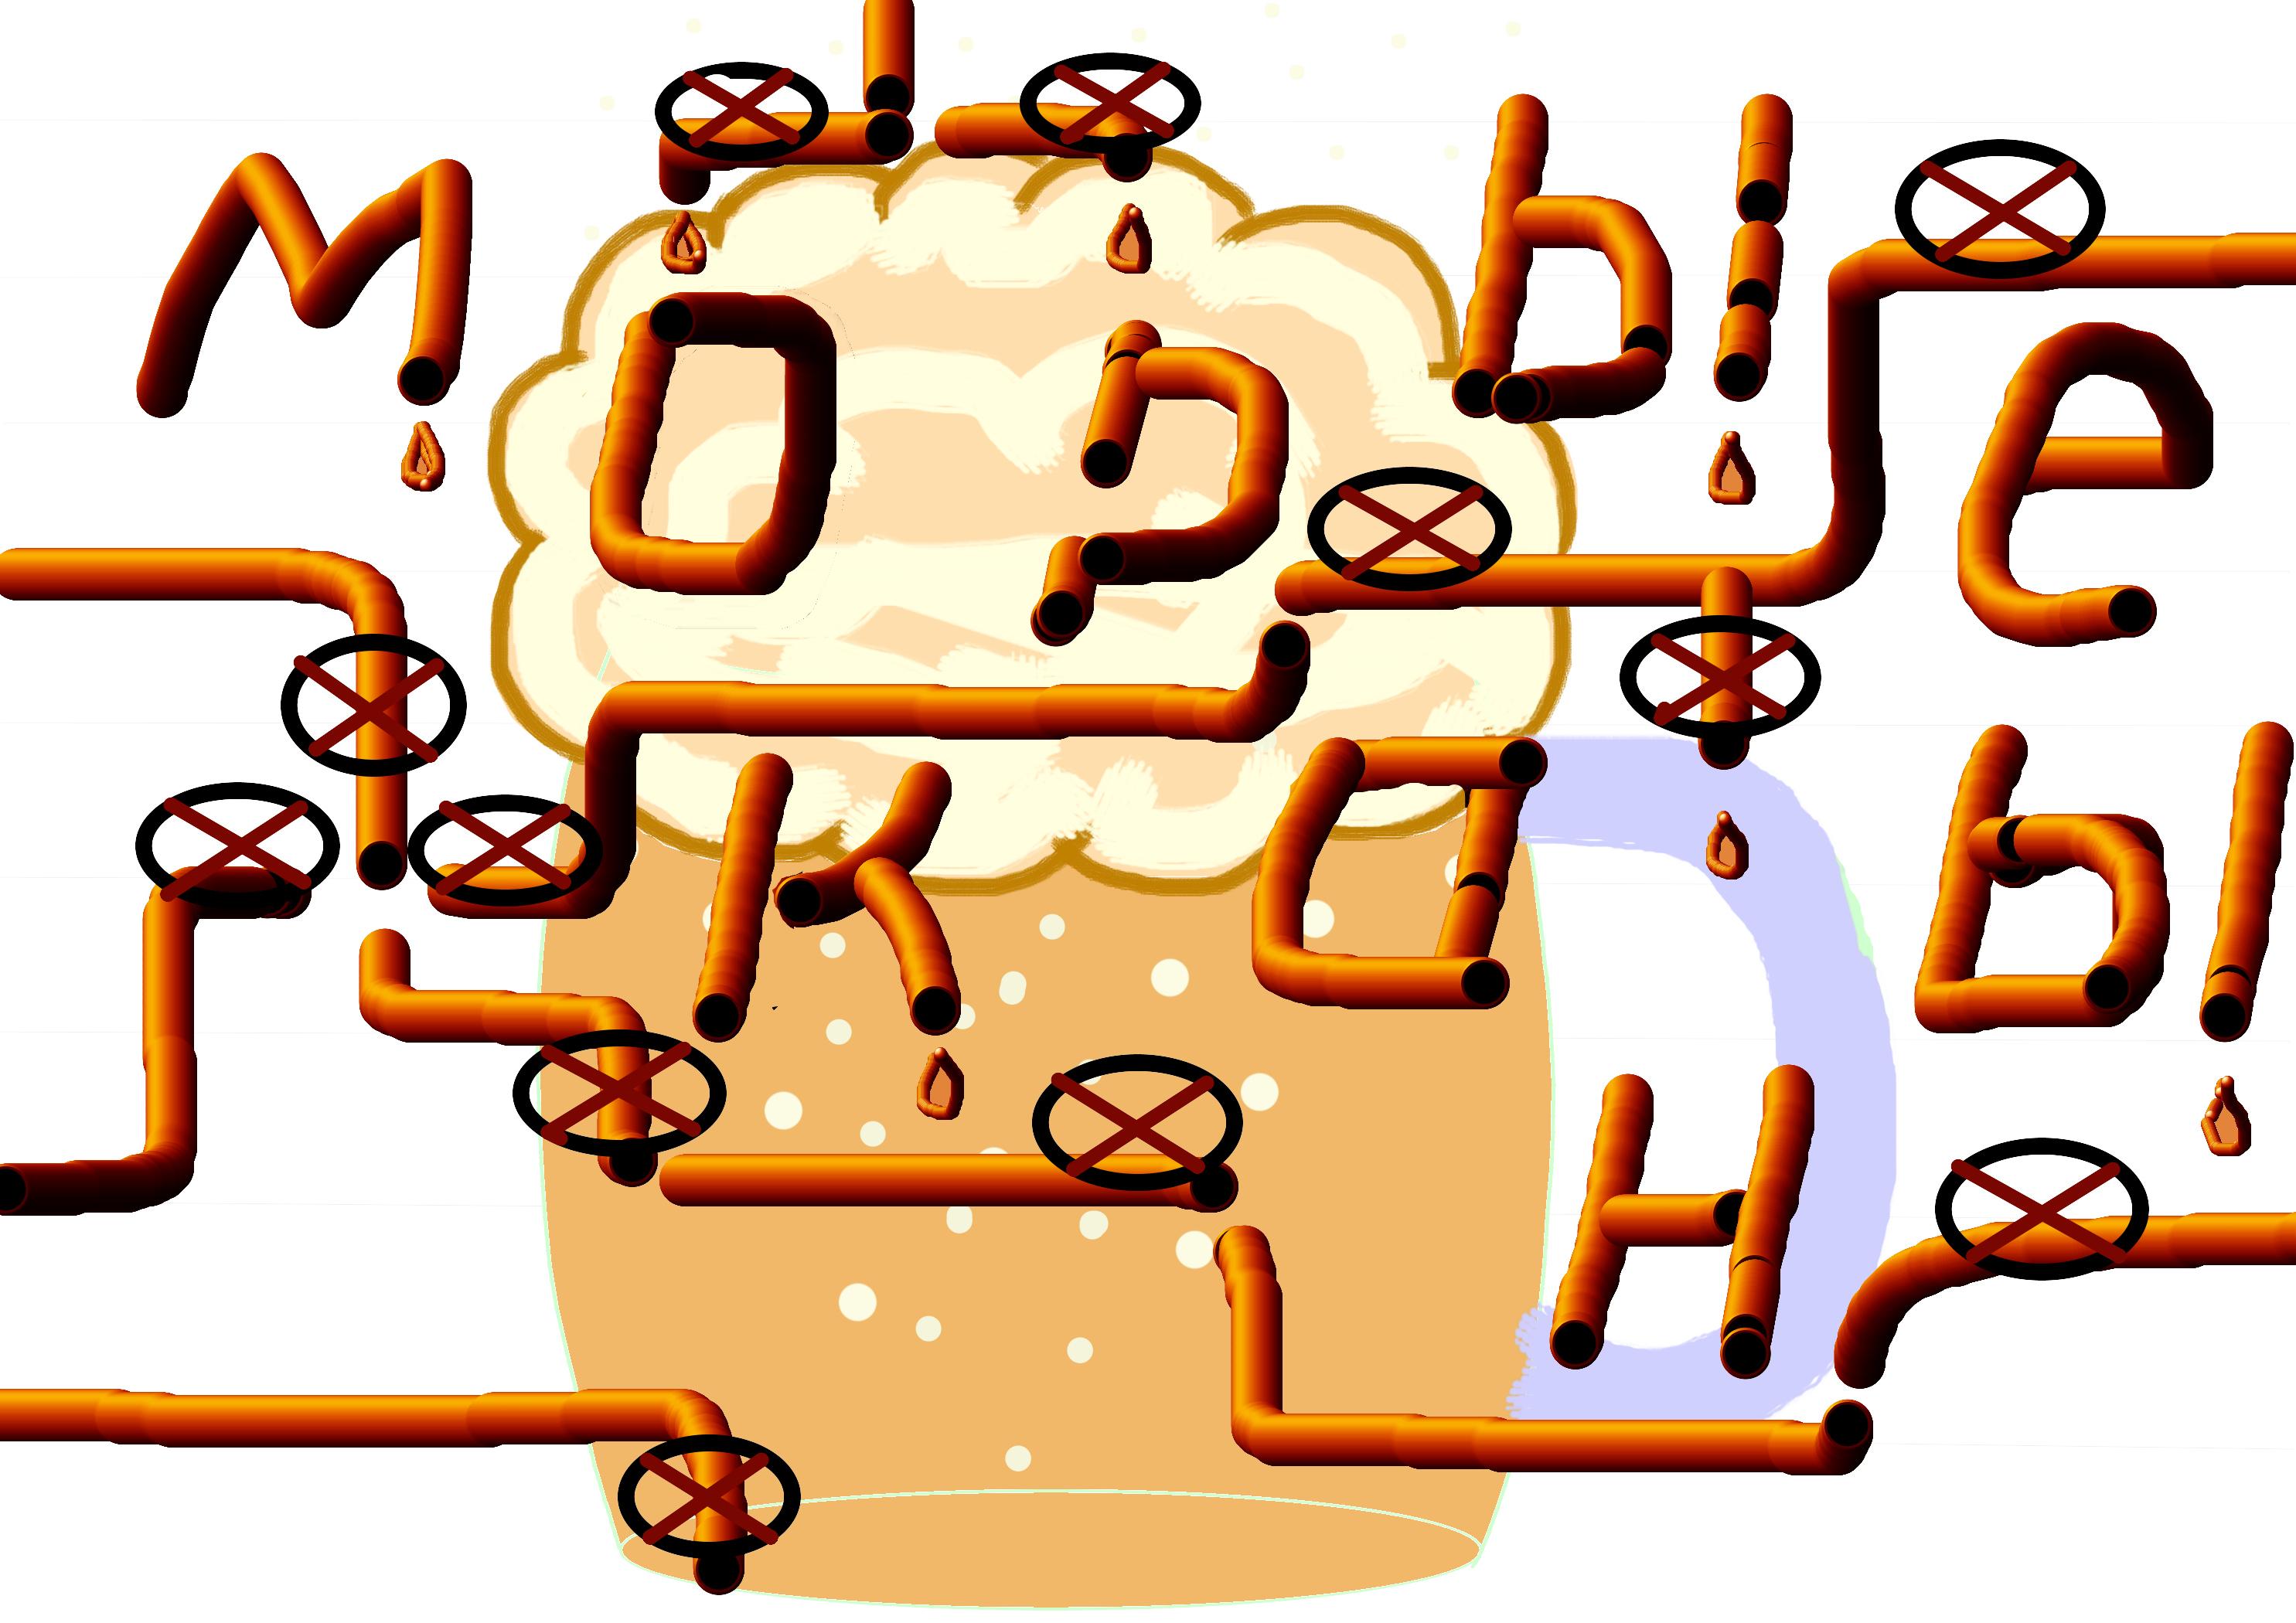 Вывеска/логотип для пивного магазина фото f_5816026ac8bc38e7.jpg